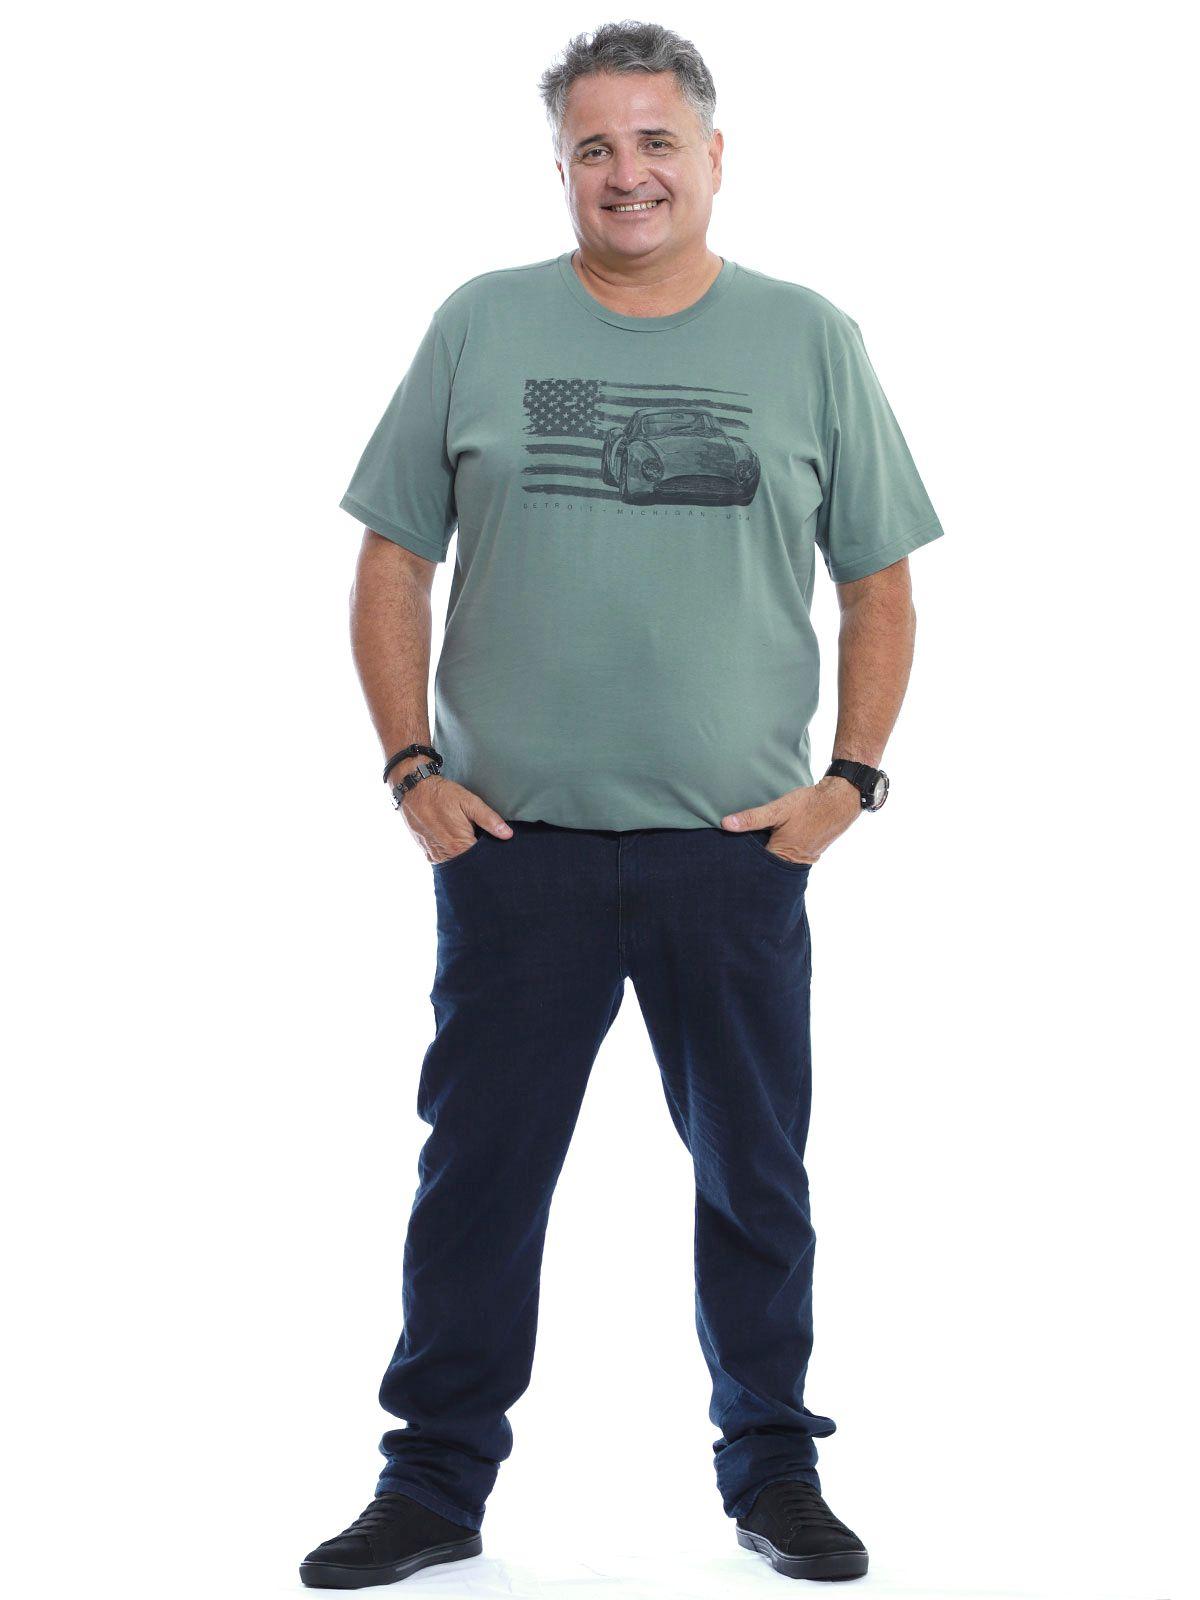 Camiseta Plus Size Masculina Gola Careca Estampa Concreto